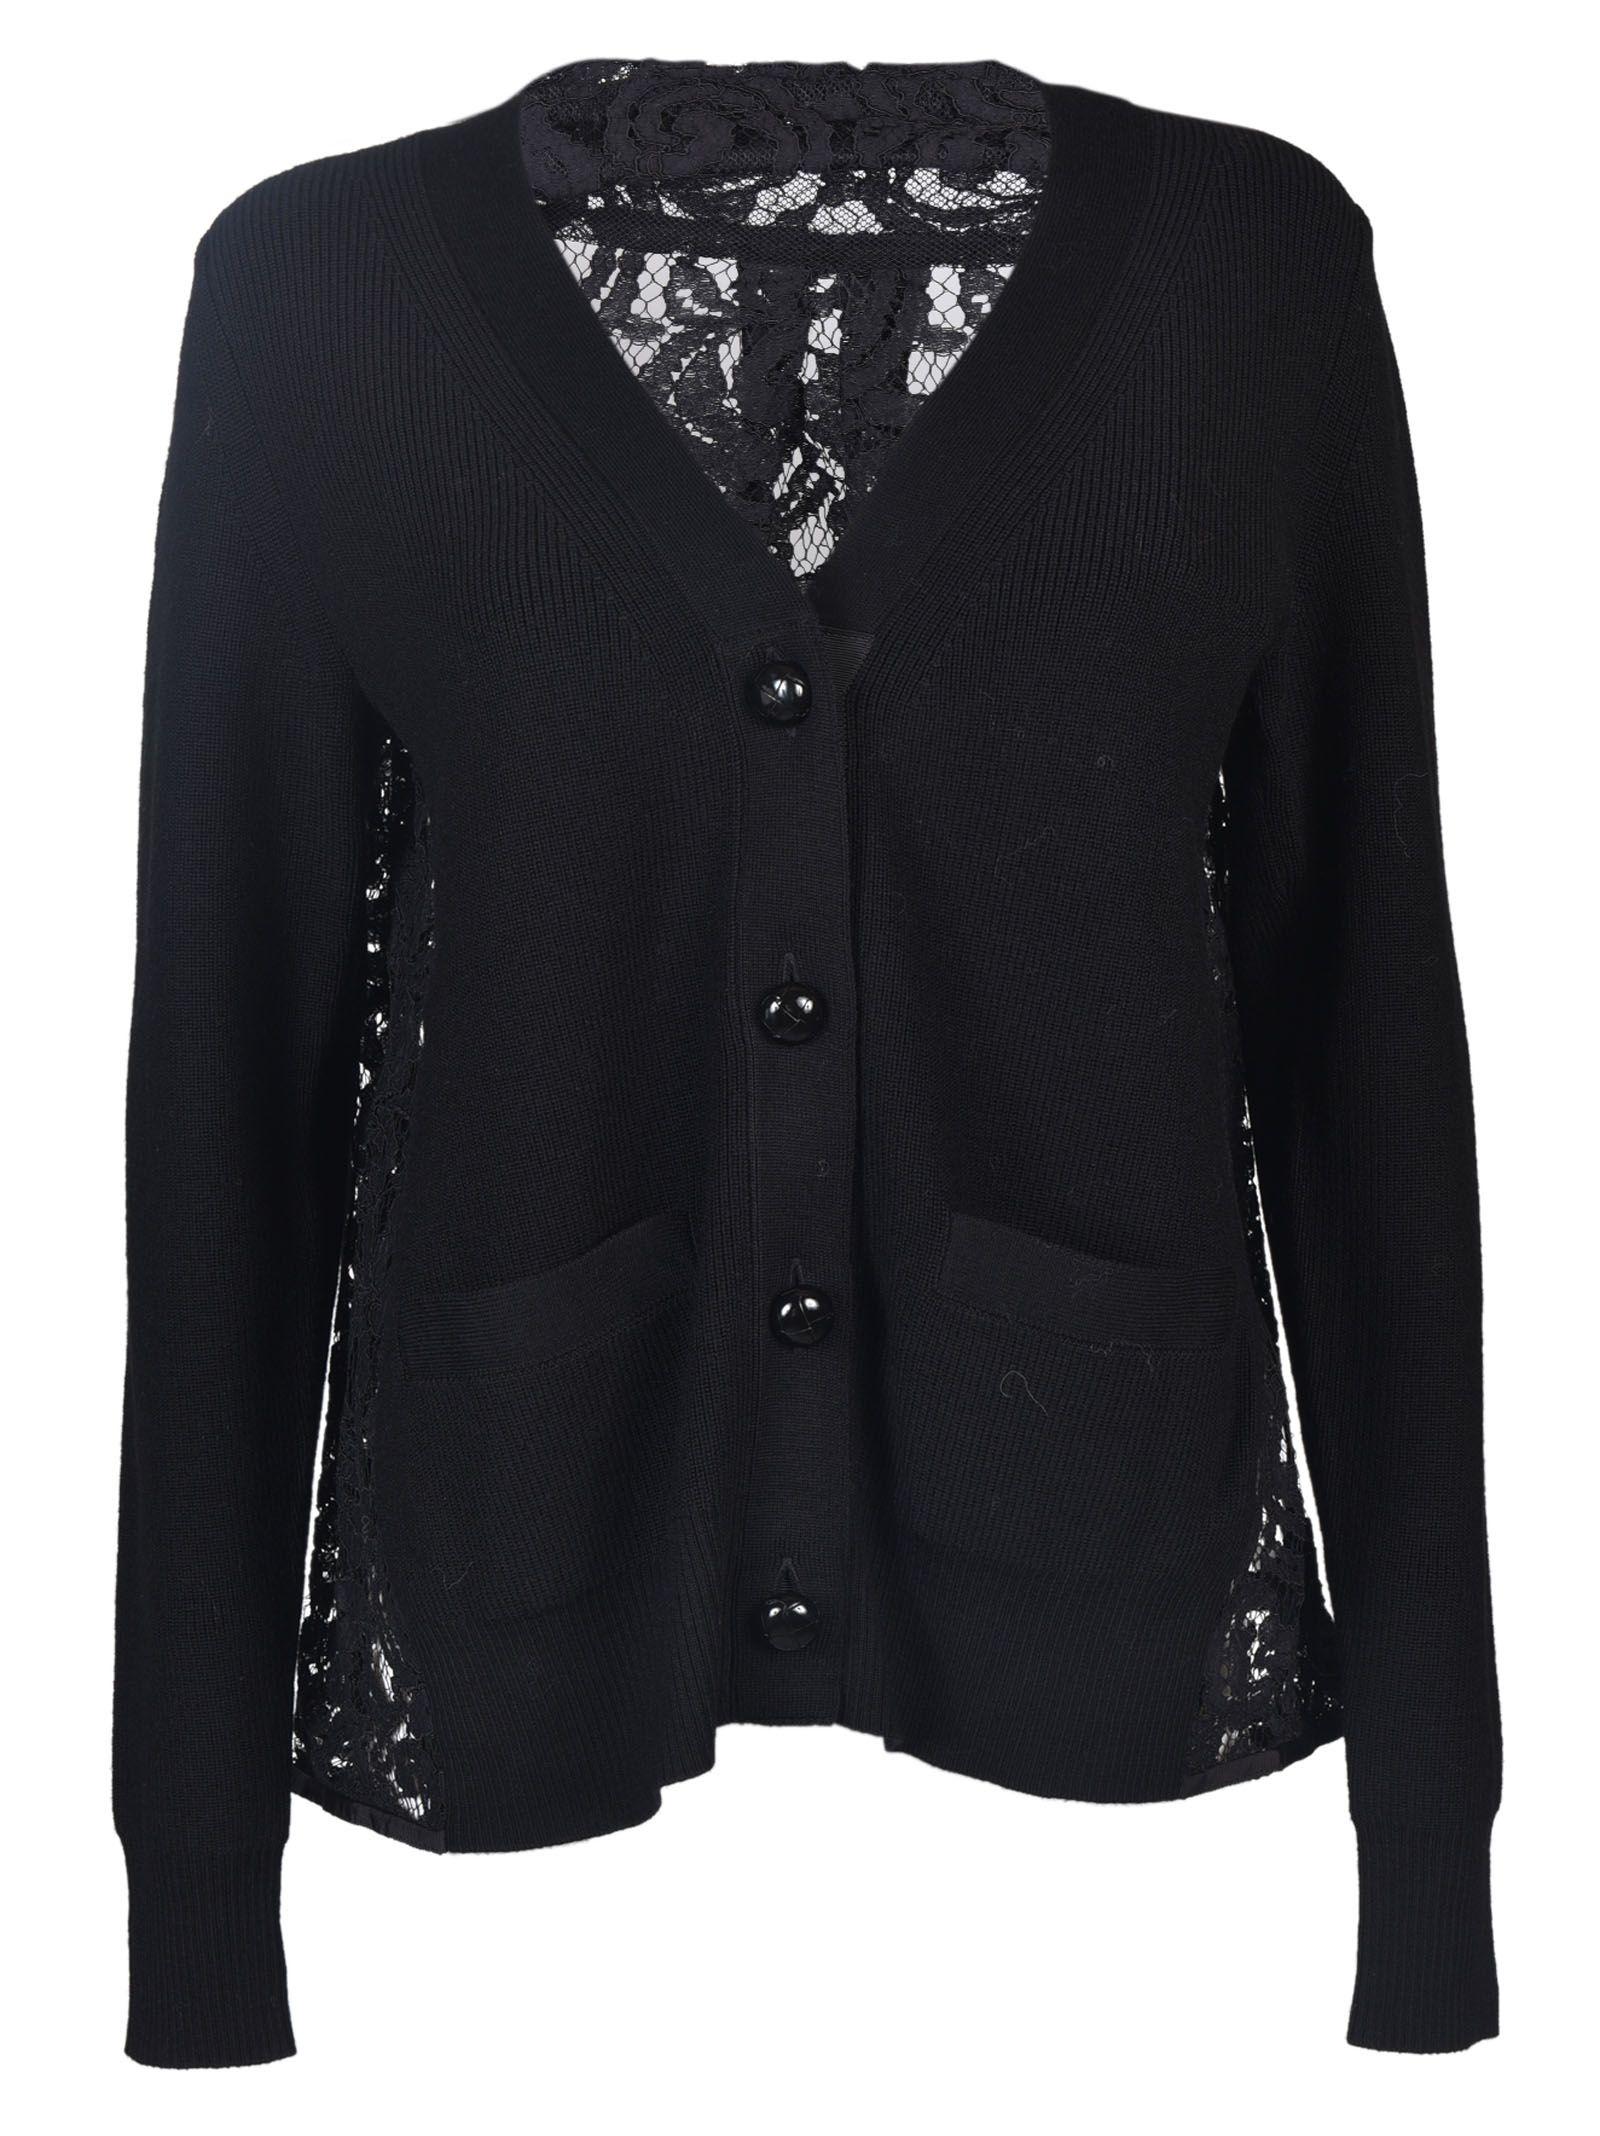 Sacai - Sacai Lace Back Cardigan - Black, Women's Cardigans | Italist